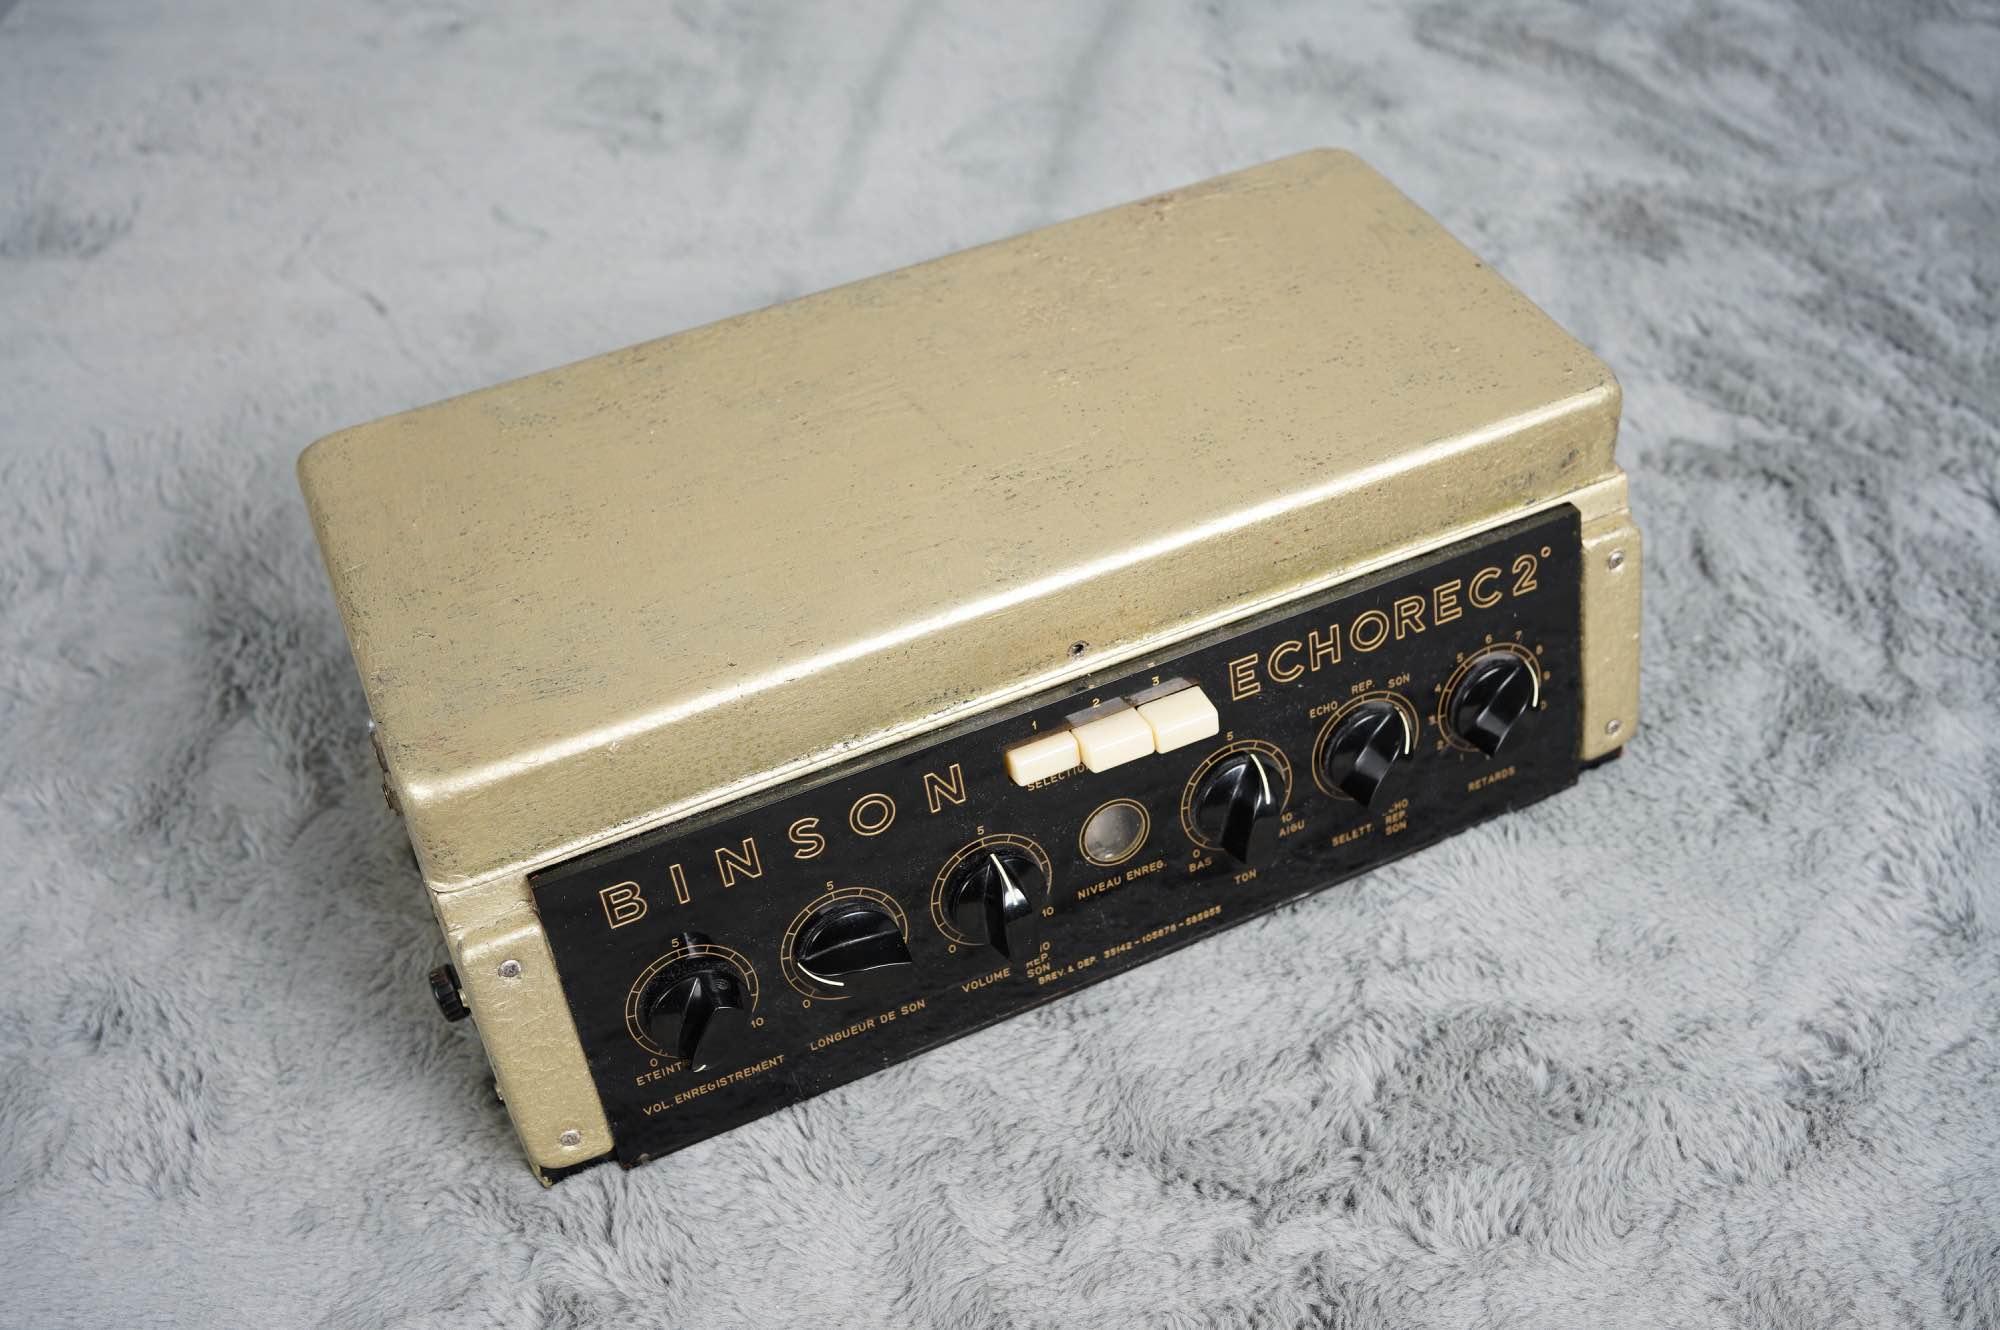 Early 60's Binson Echorec 2 T7E - Dan Coggins serviced